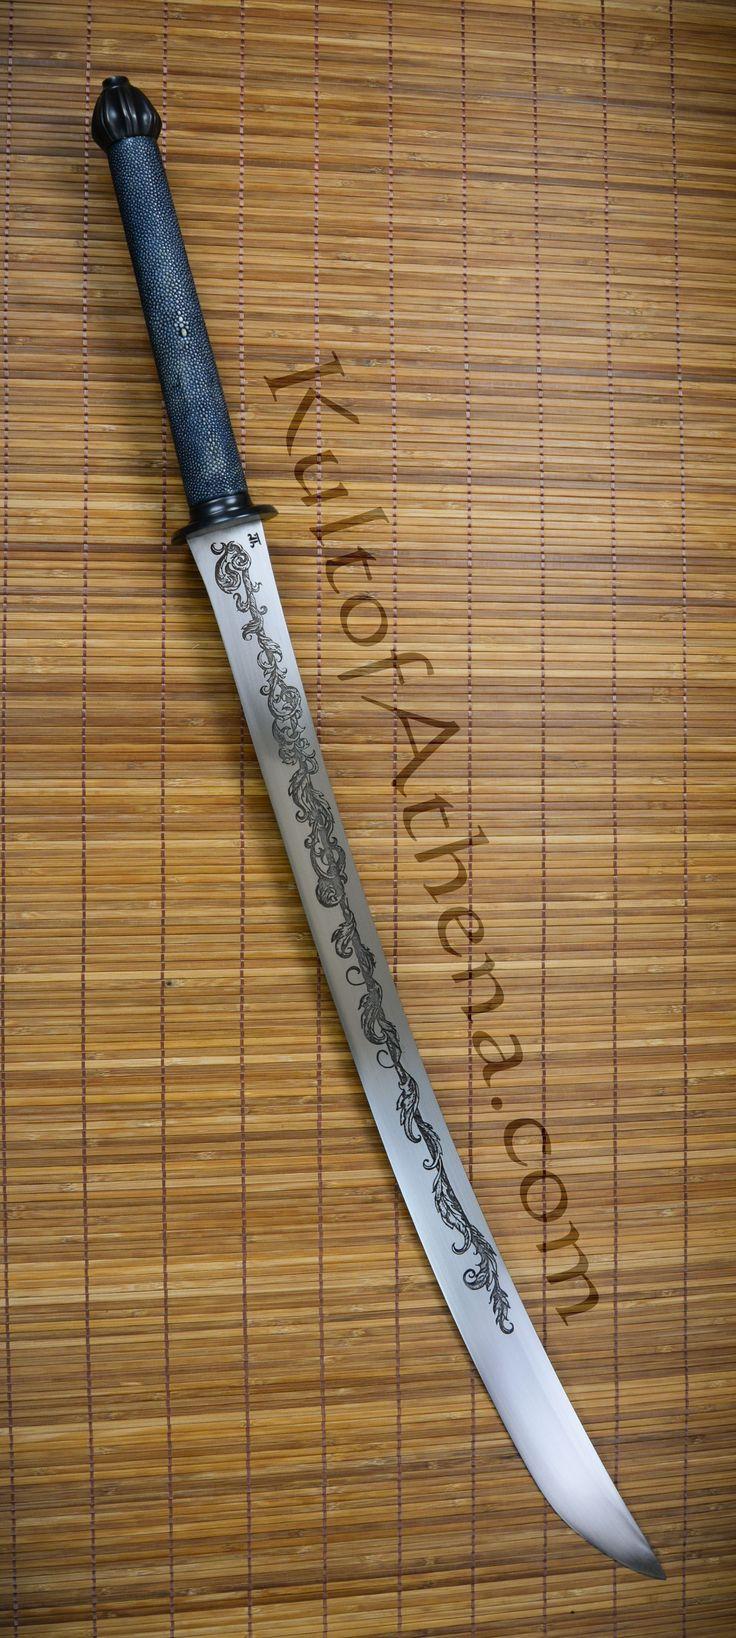 Longship Armoury - The Mandate - Custom Fantasy Dha Sword